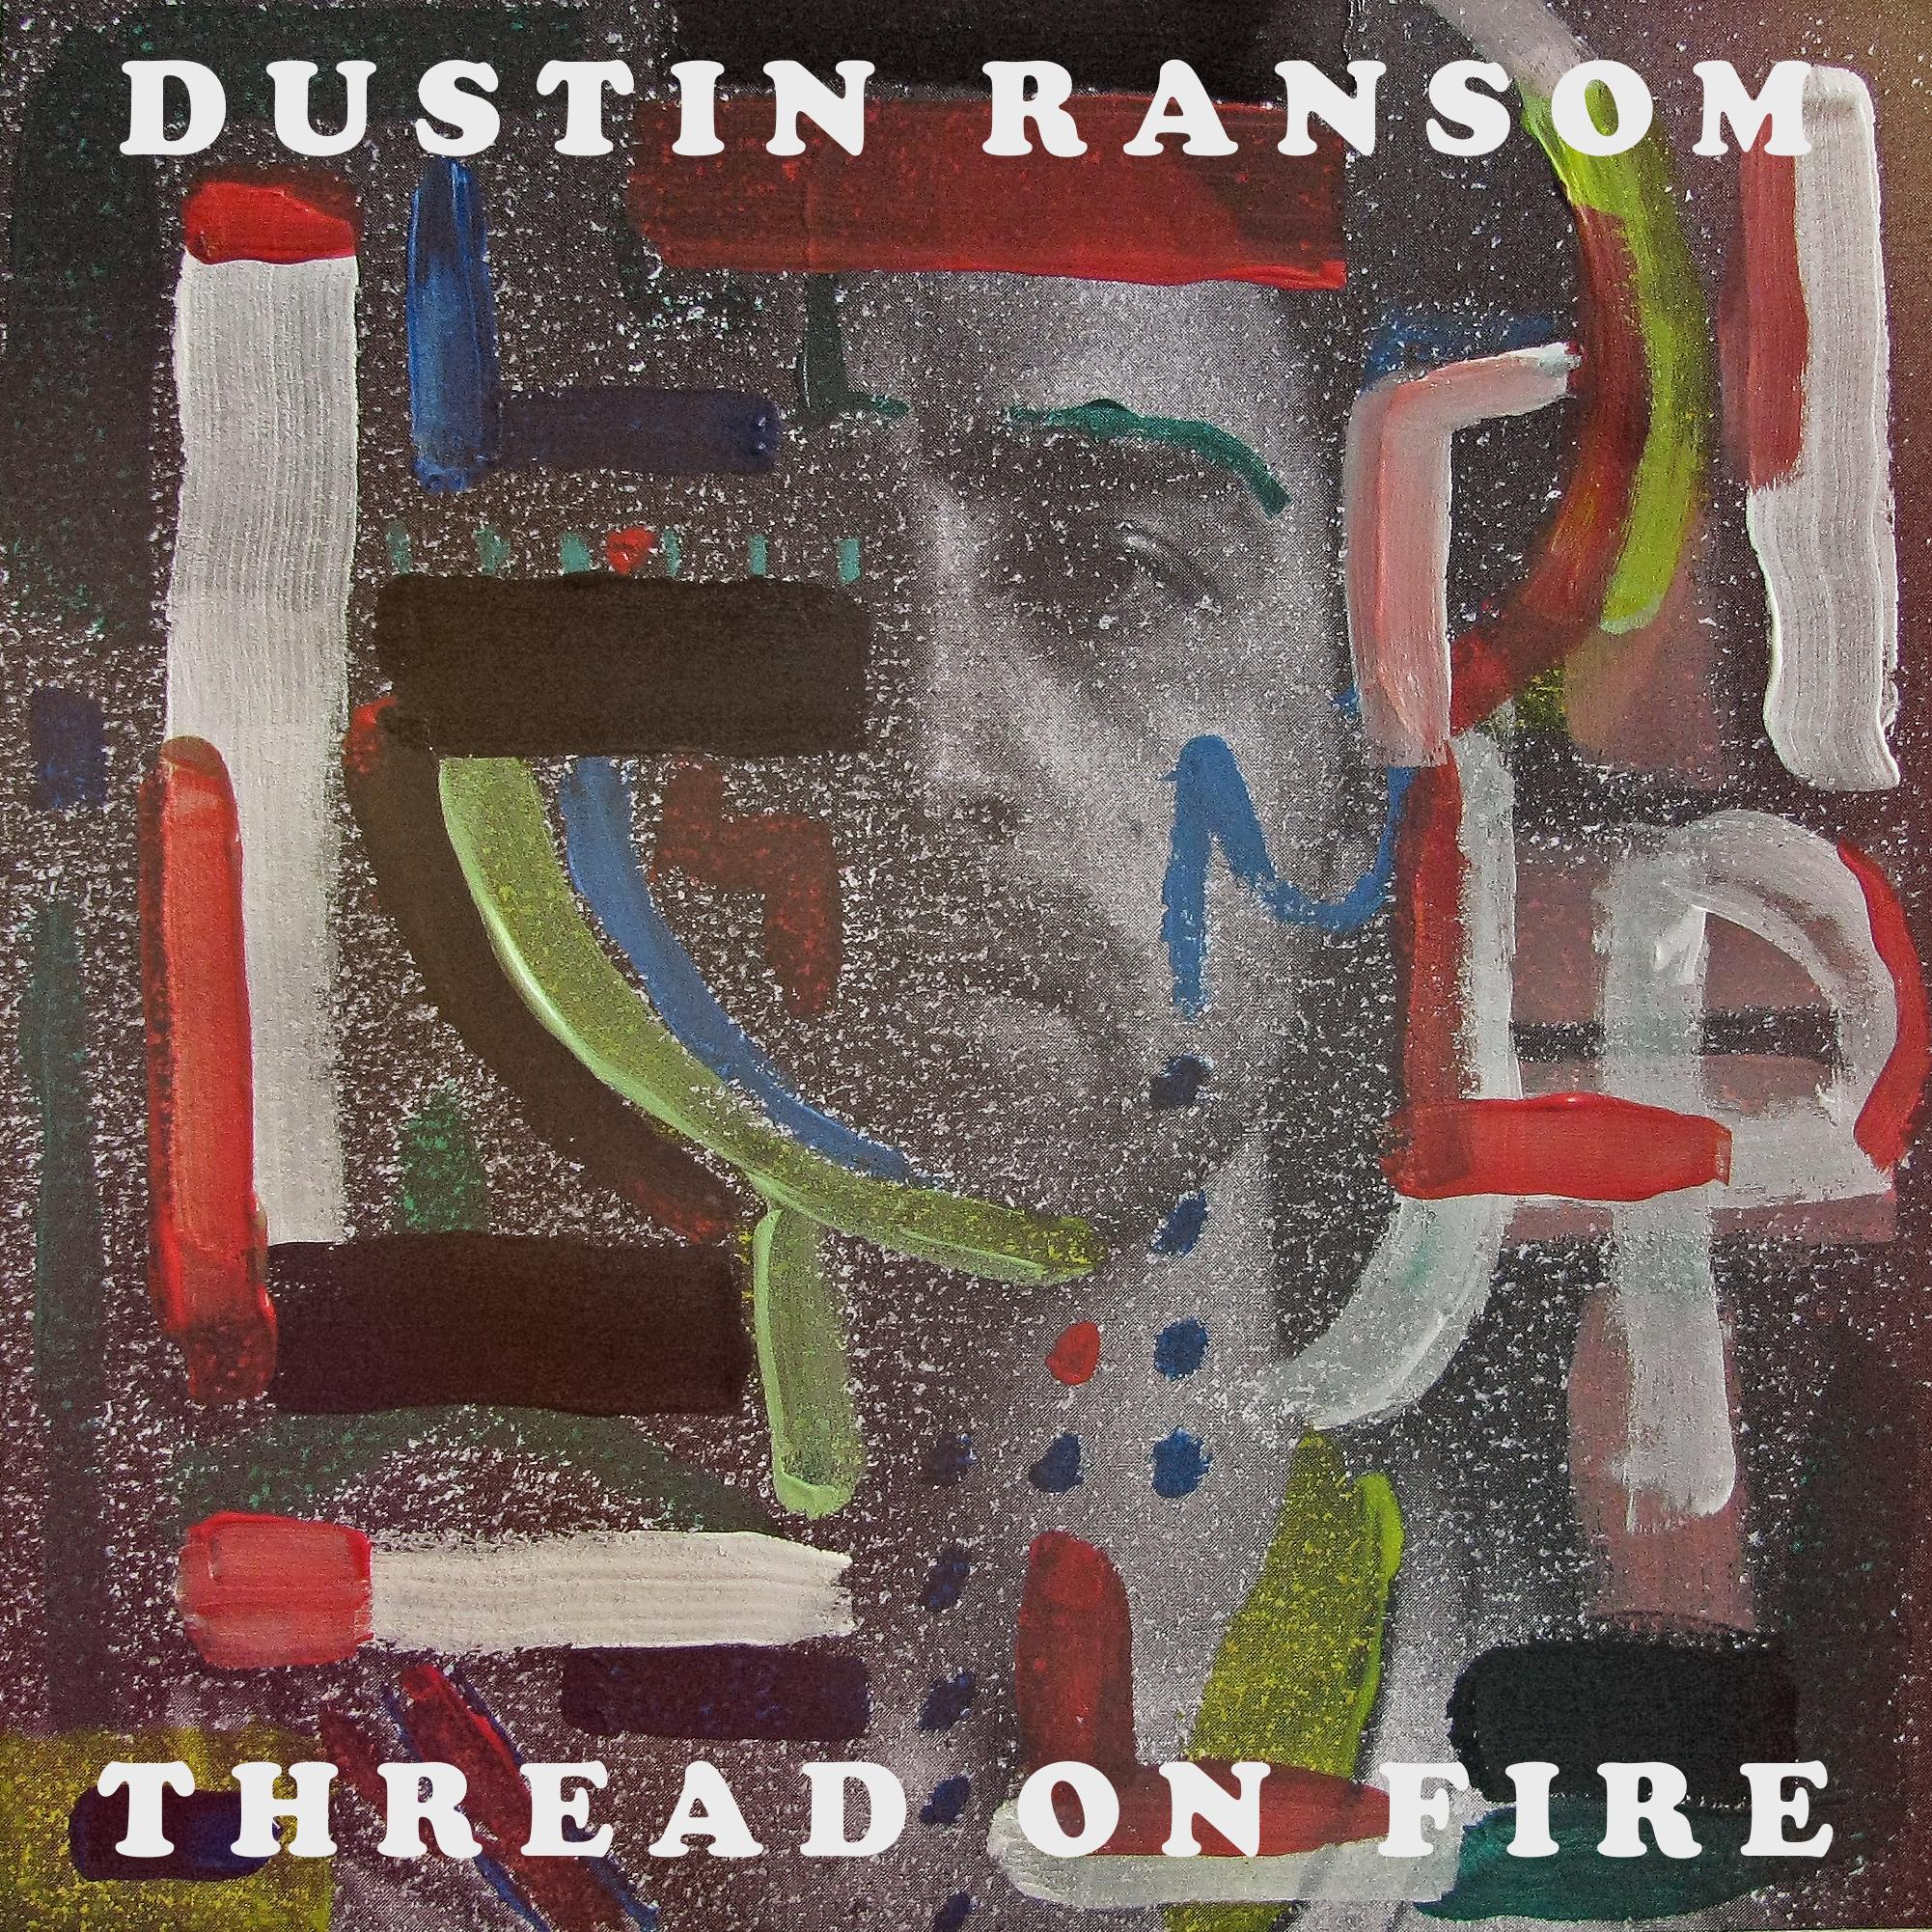 Thread On Fire Album Art.jpg